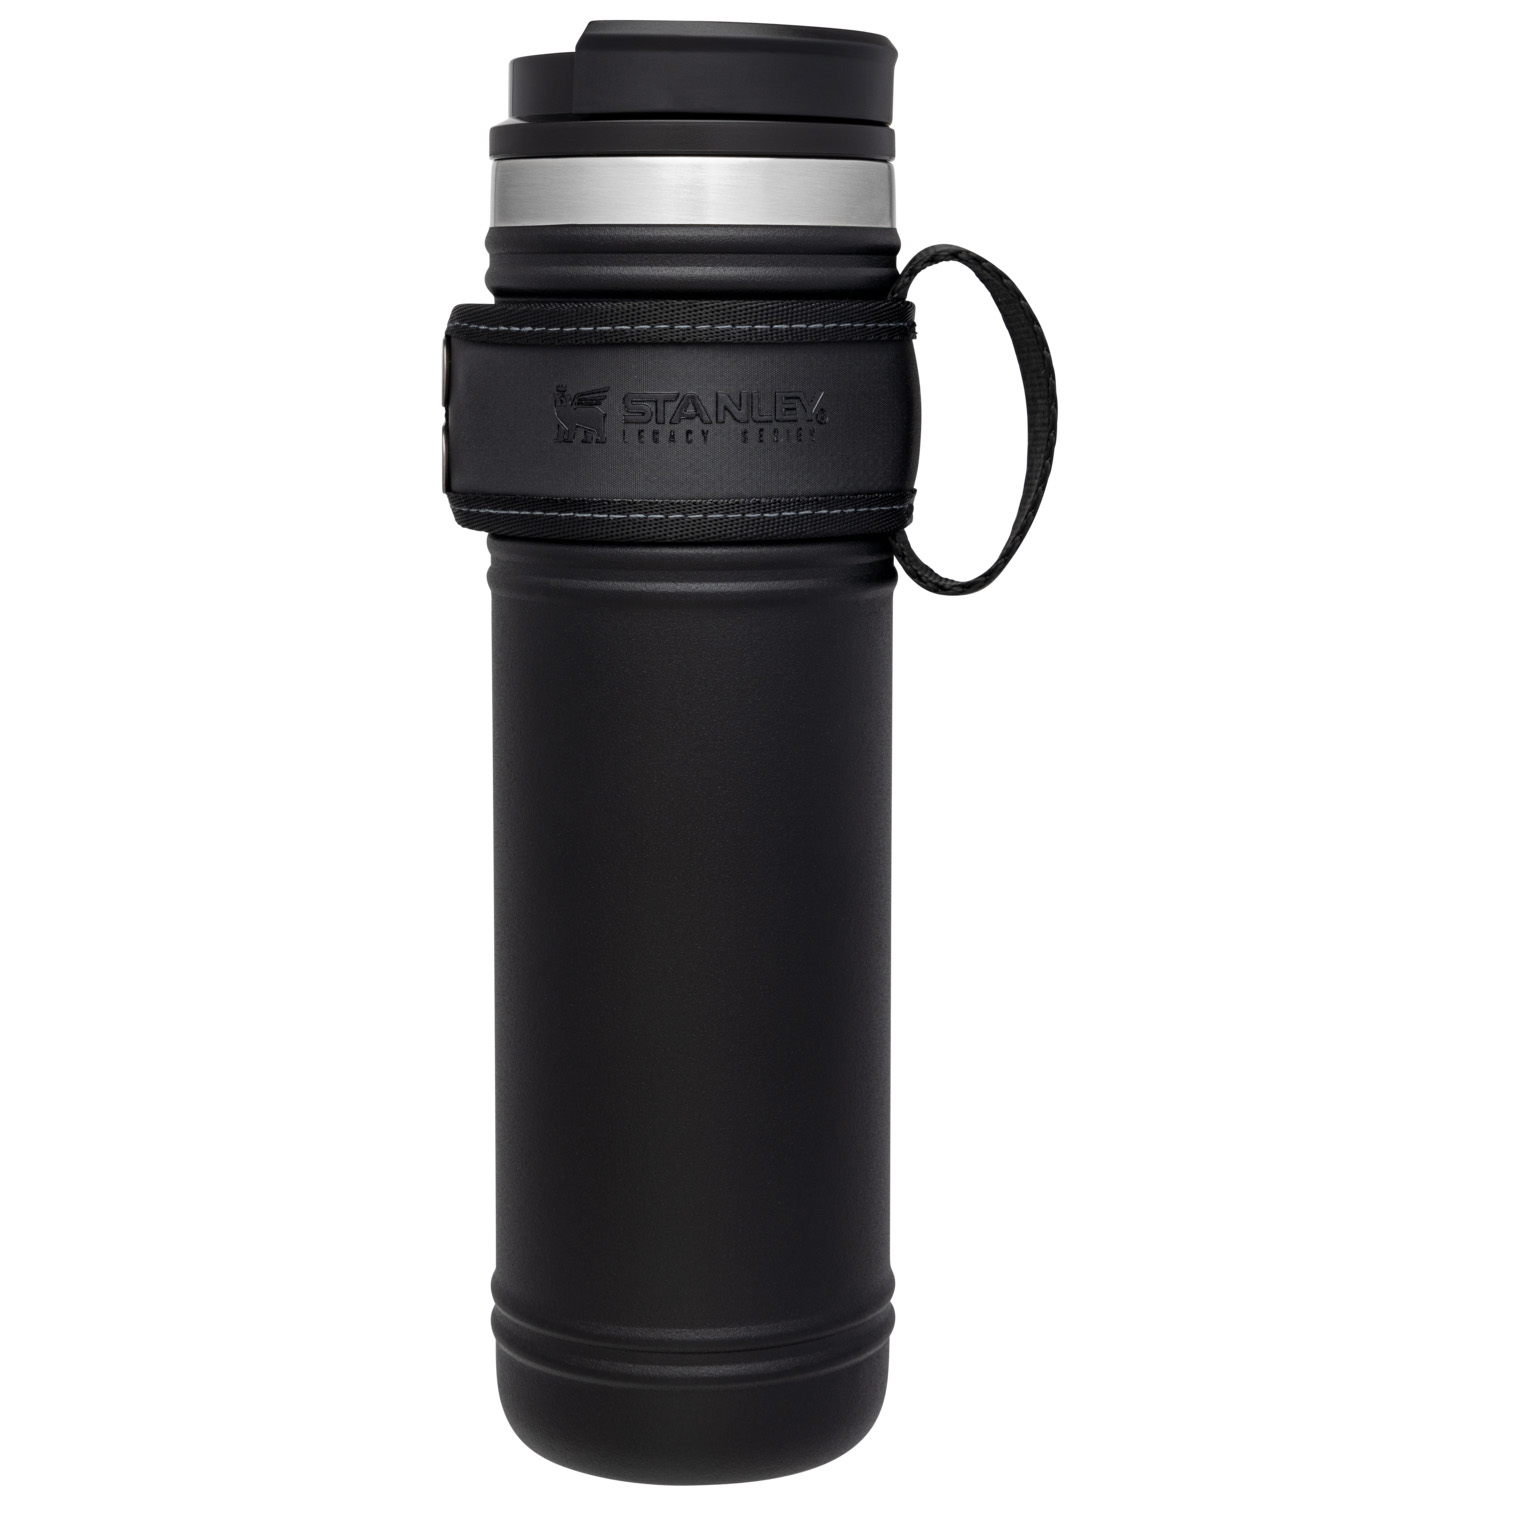 Stanley Legacy Neverleak™ Travel Mug   20 oz – Black